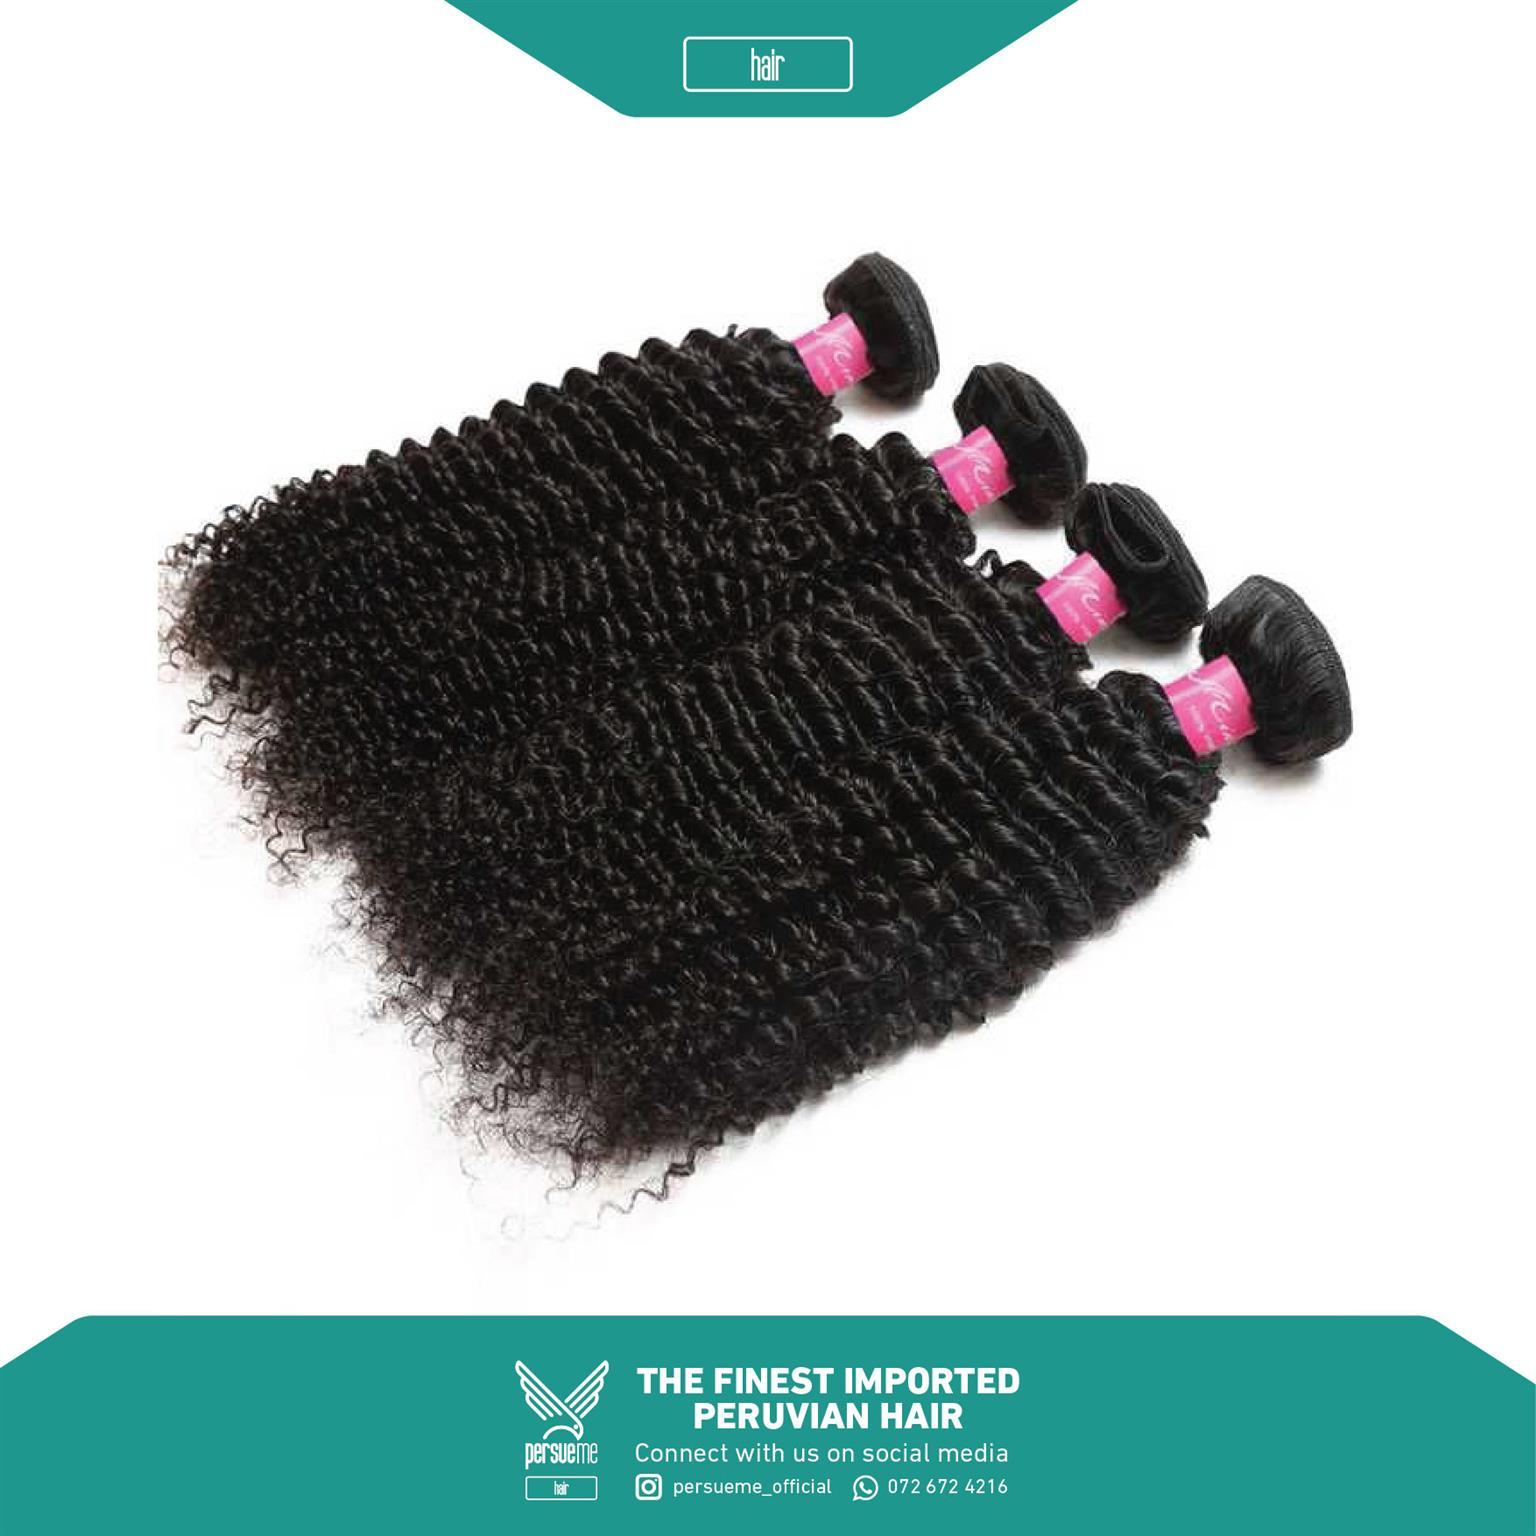 Peruvian/Brazilian Imported Hair